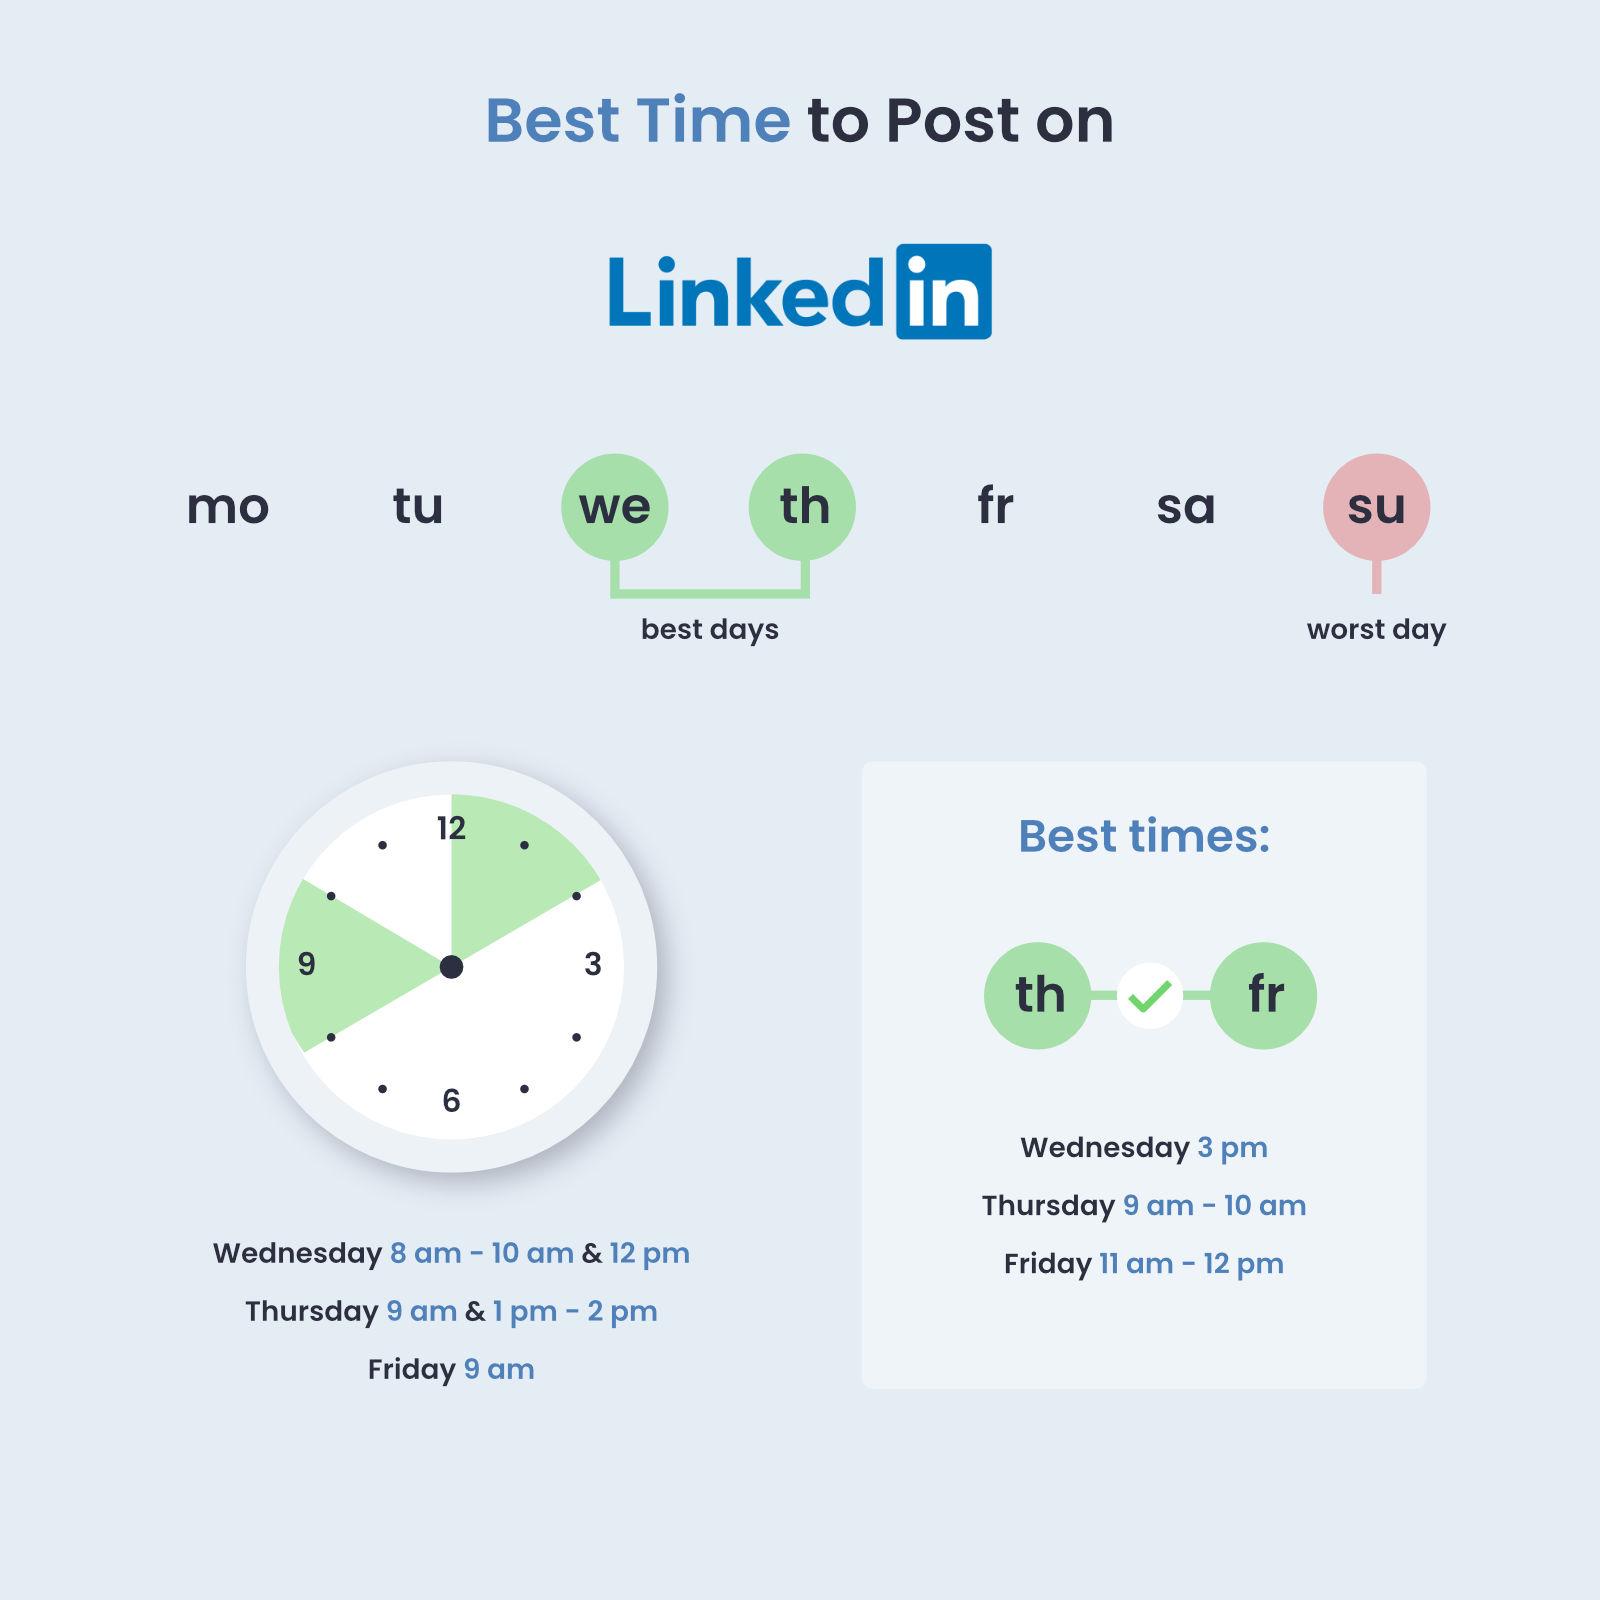 linkedin time to post